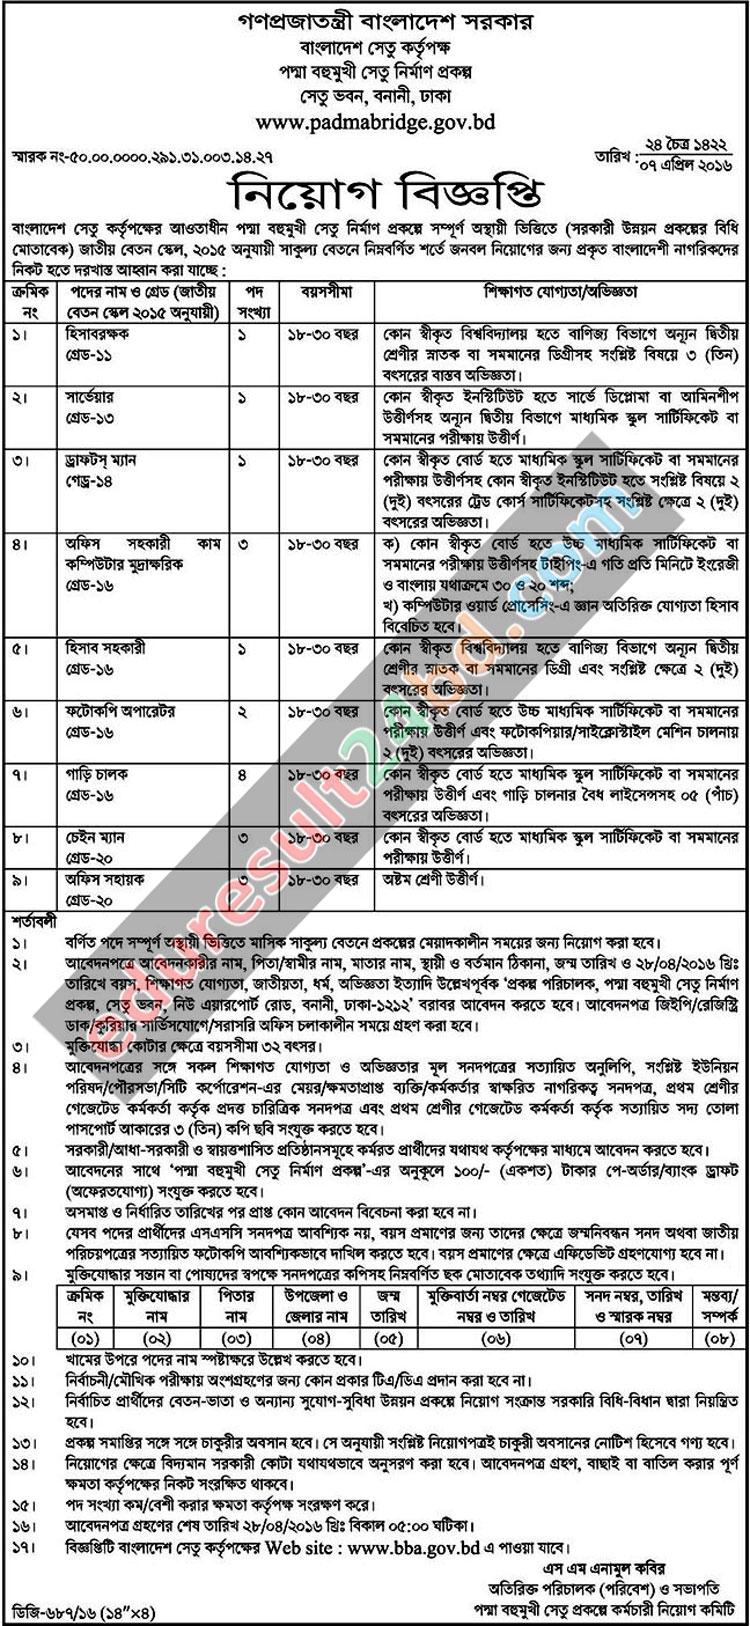 Bangladesh Bridge Authority Job Circular 2016